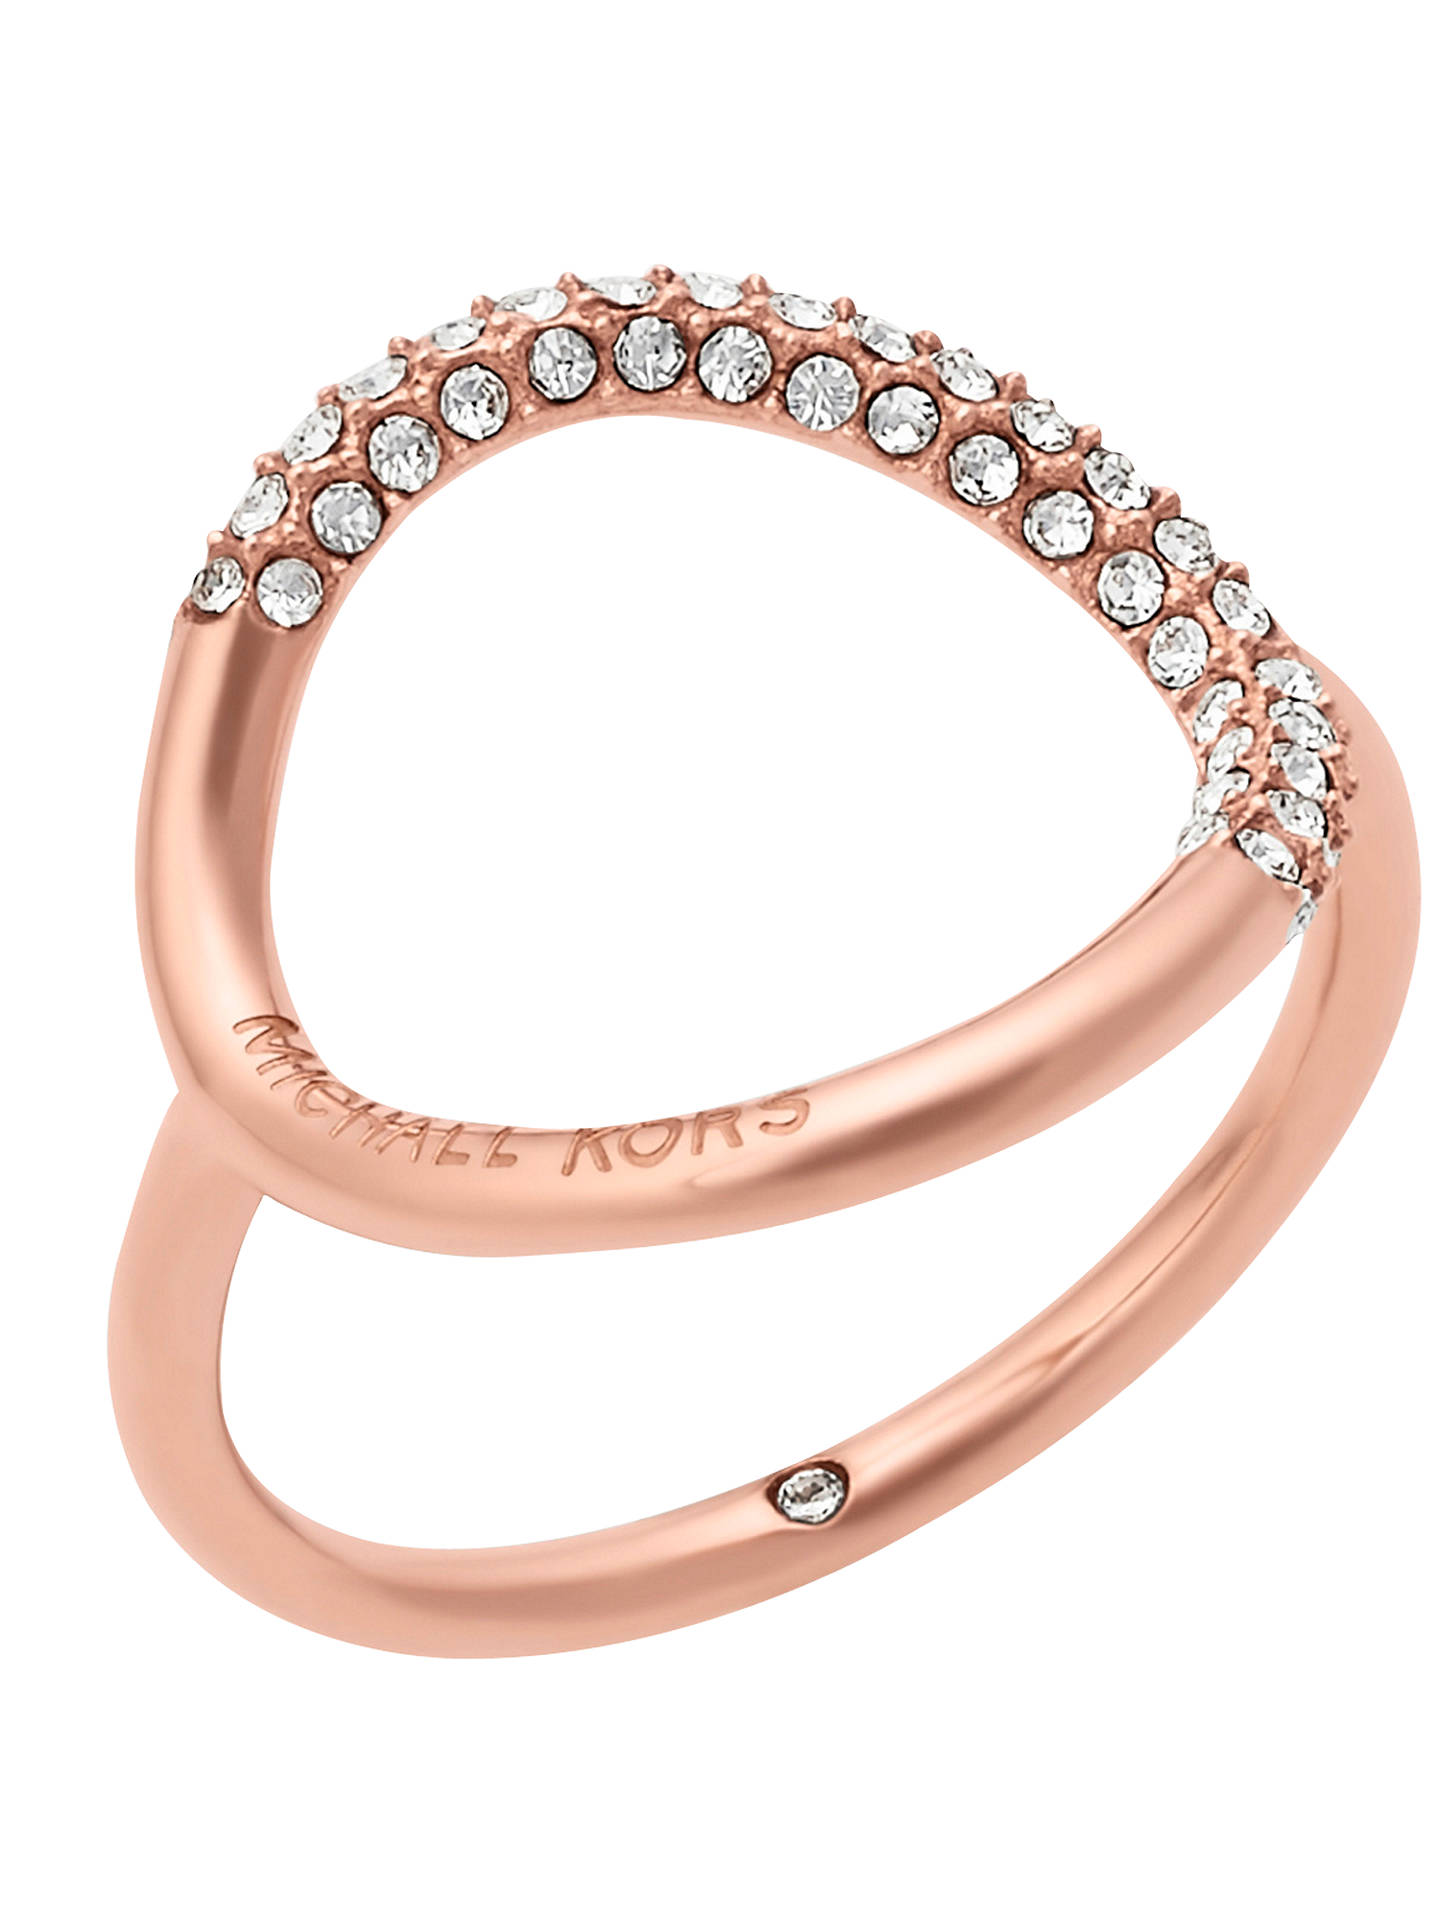 Michael Kors Open Circle Crystal Pavé Ring Rose Gold L½ Online At Johnlewis